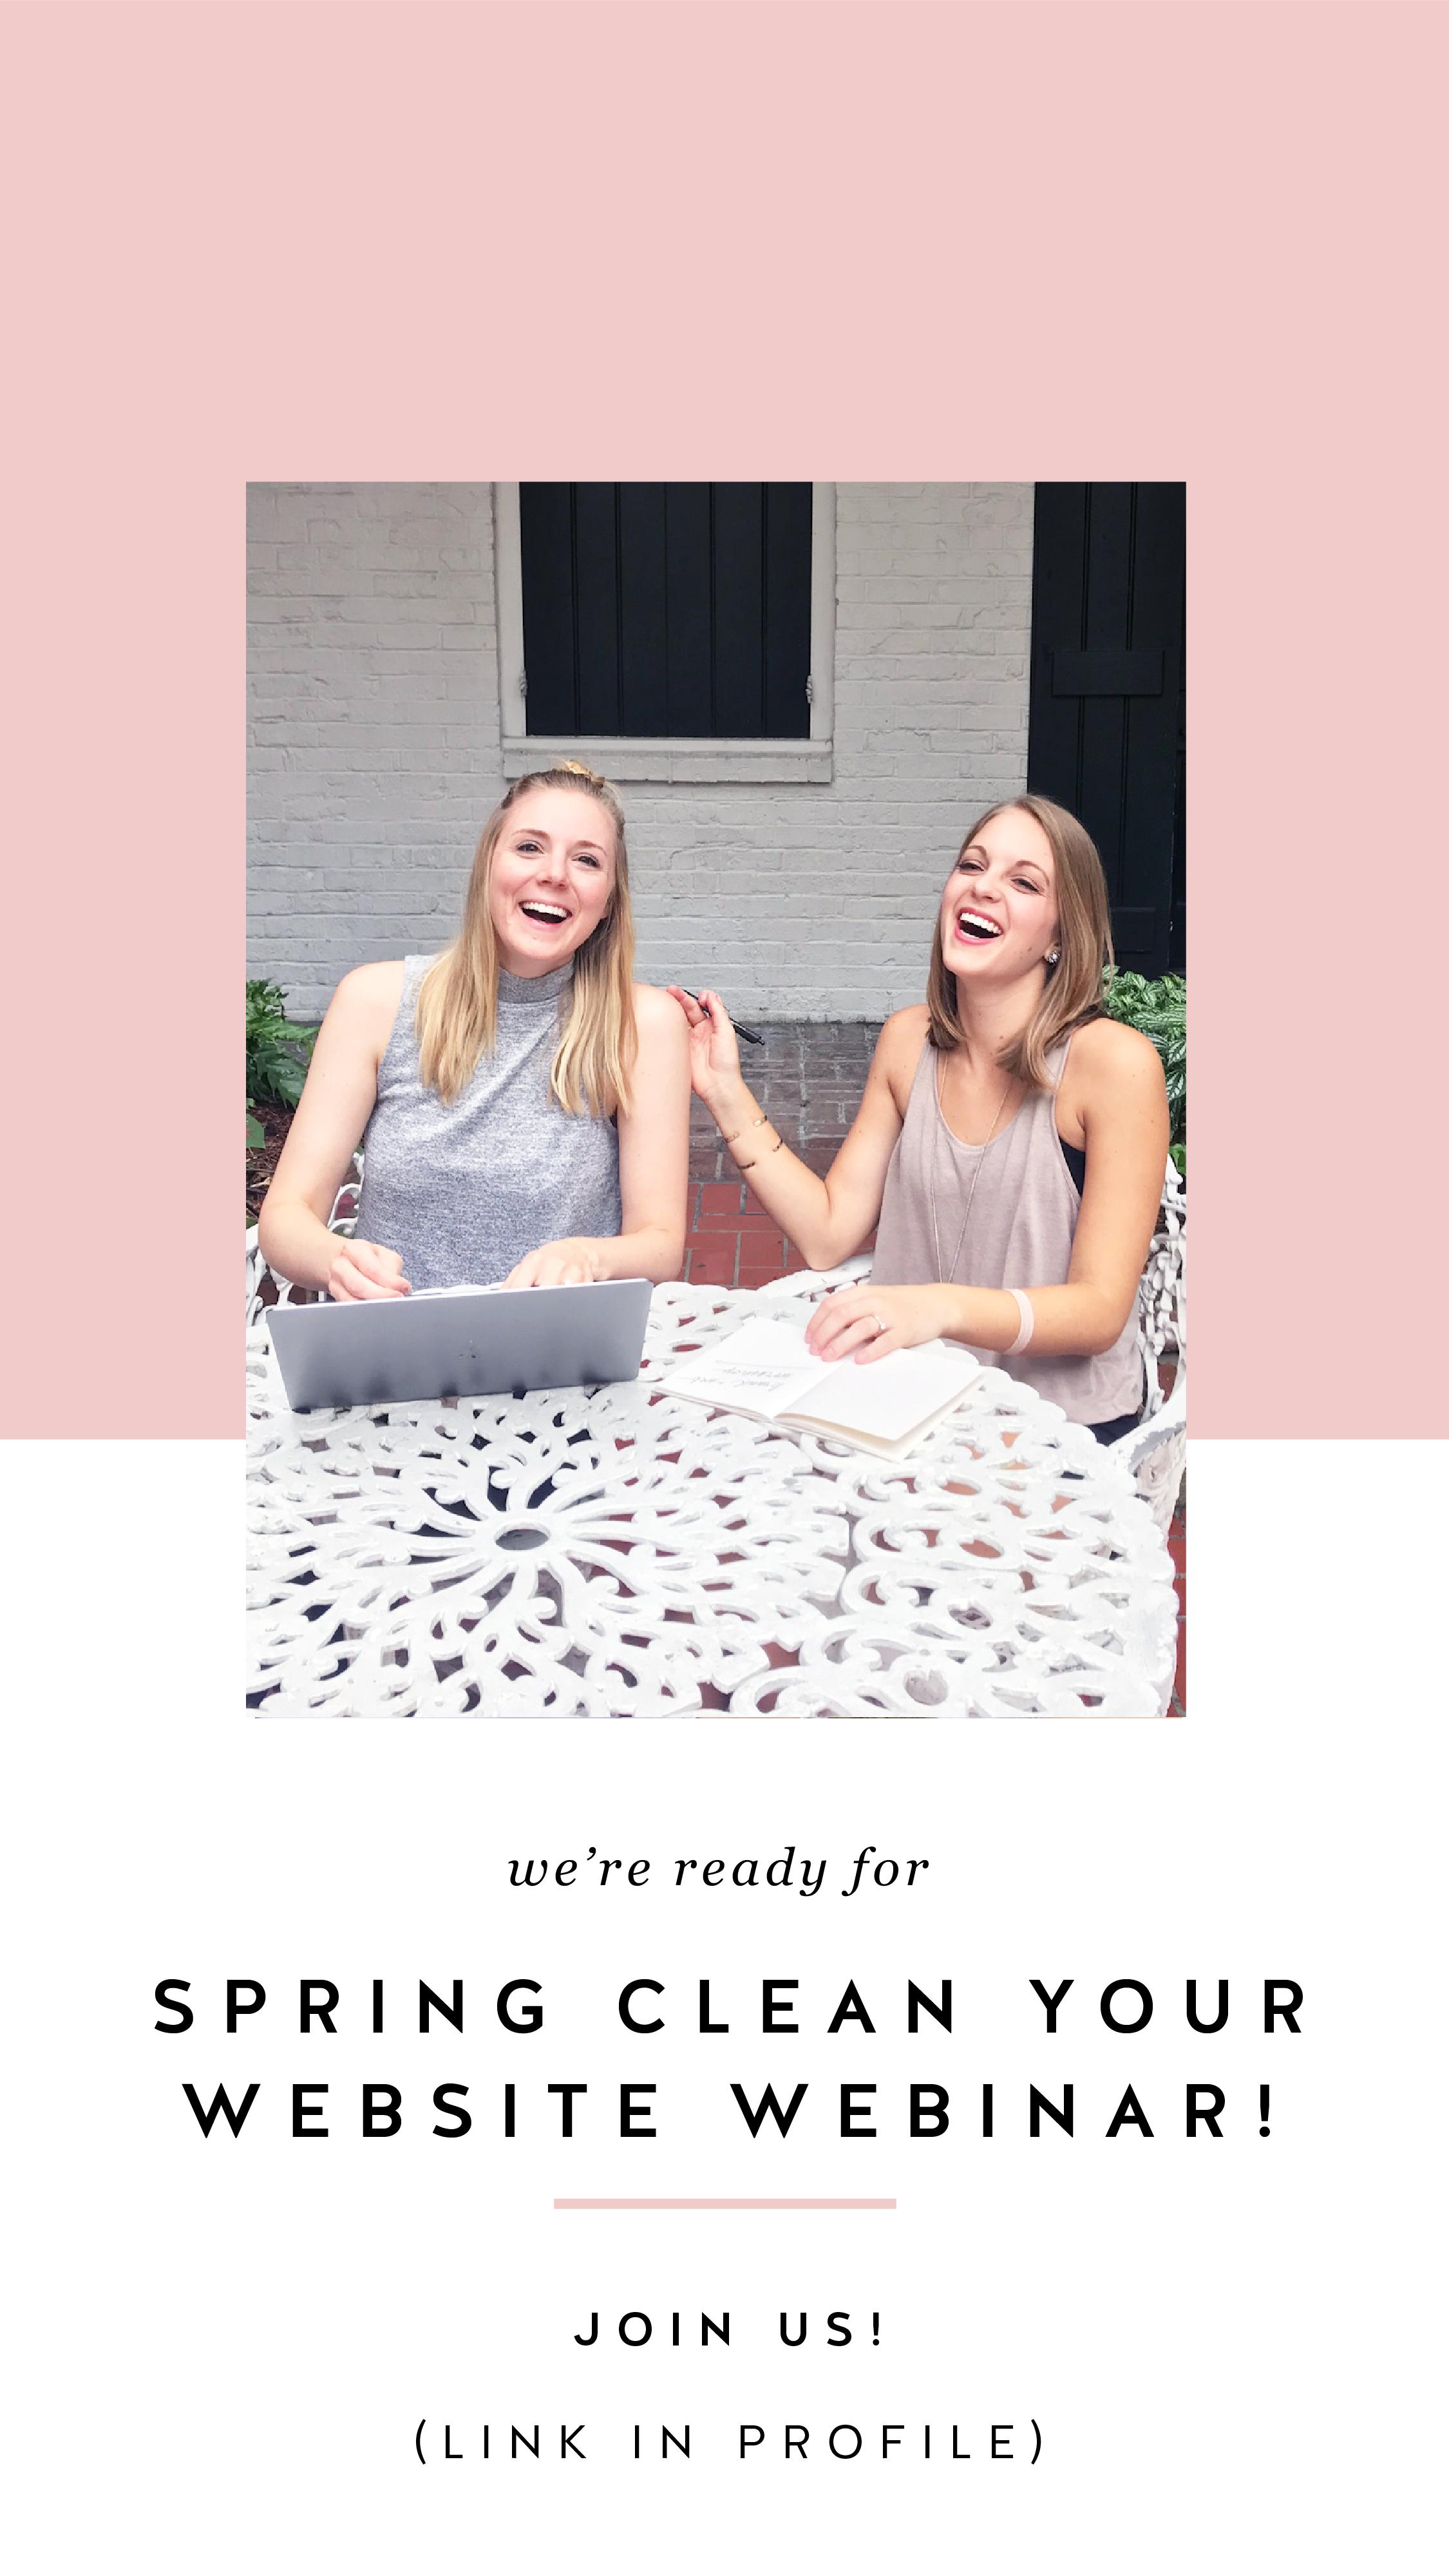 spring-clean-your-website-webinar-14.png